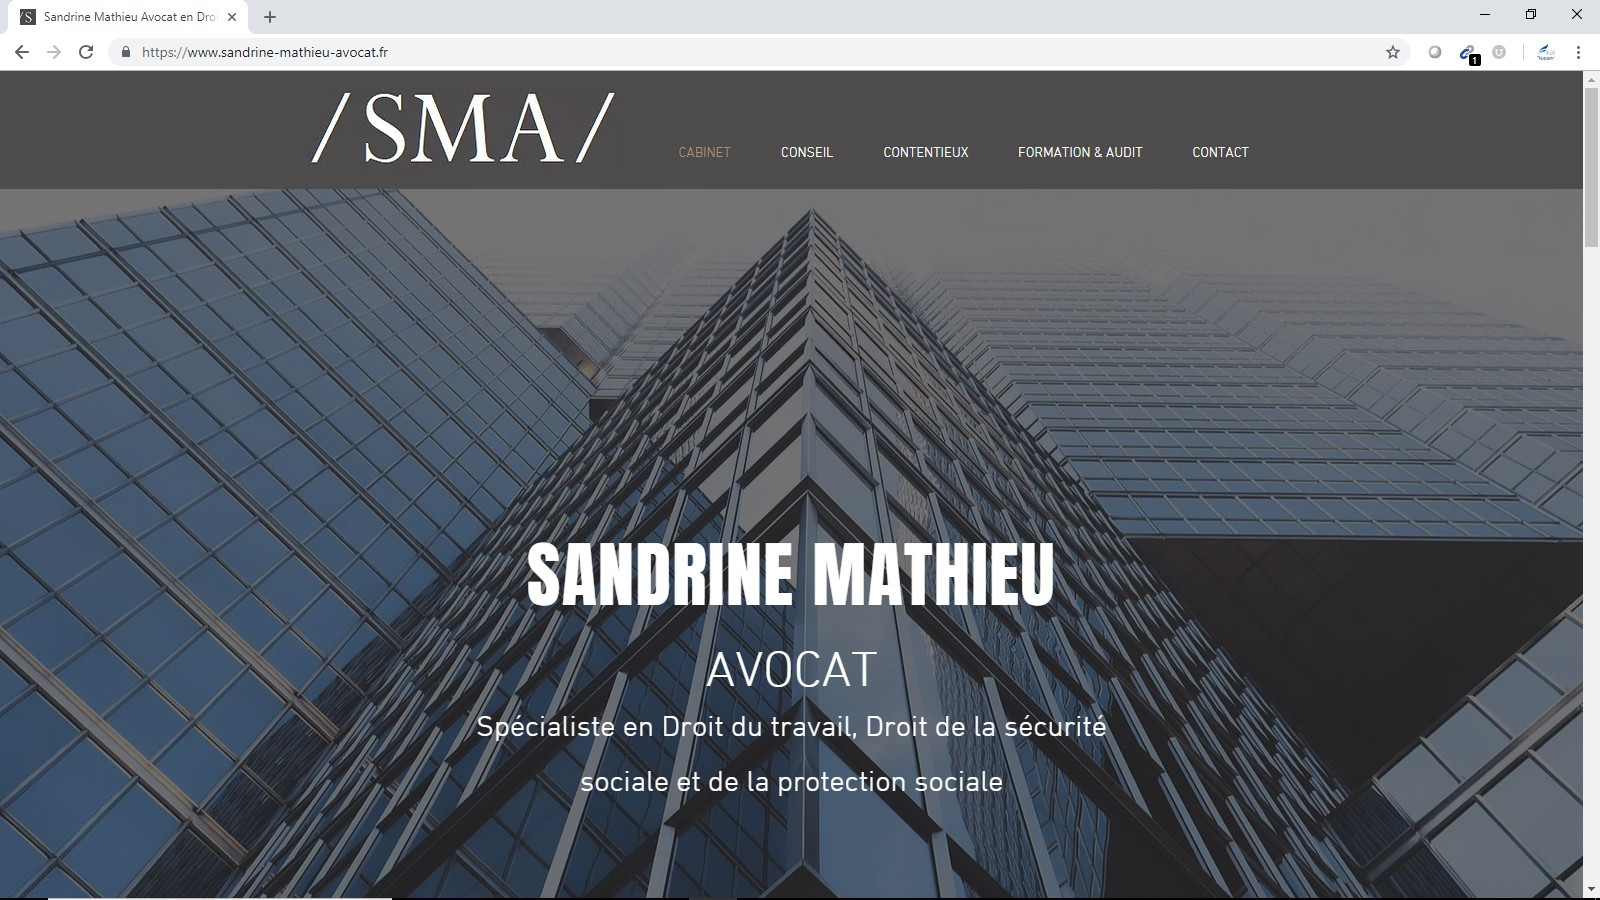 Sandrine Mathieu Avocat